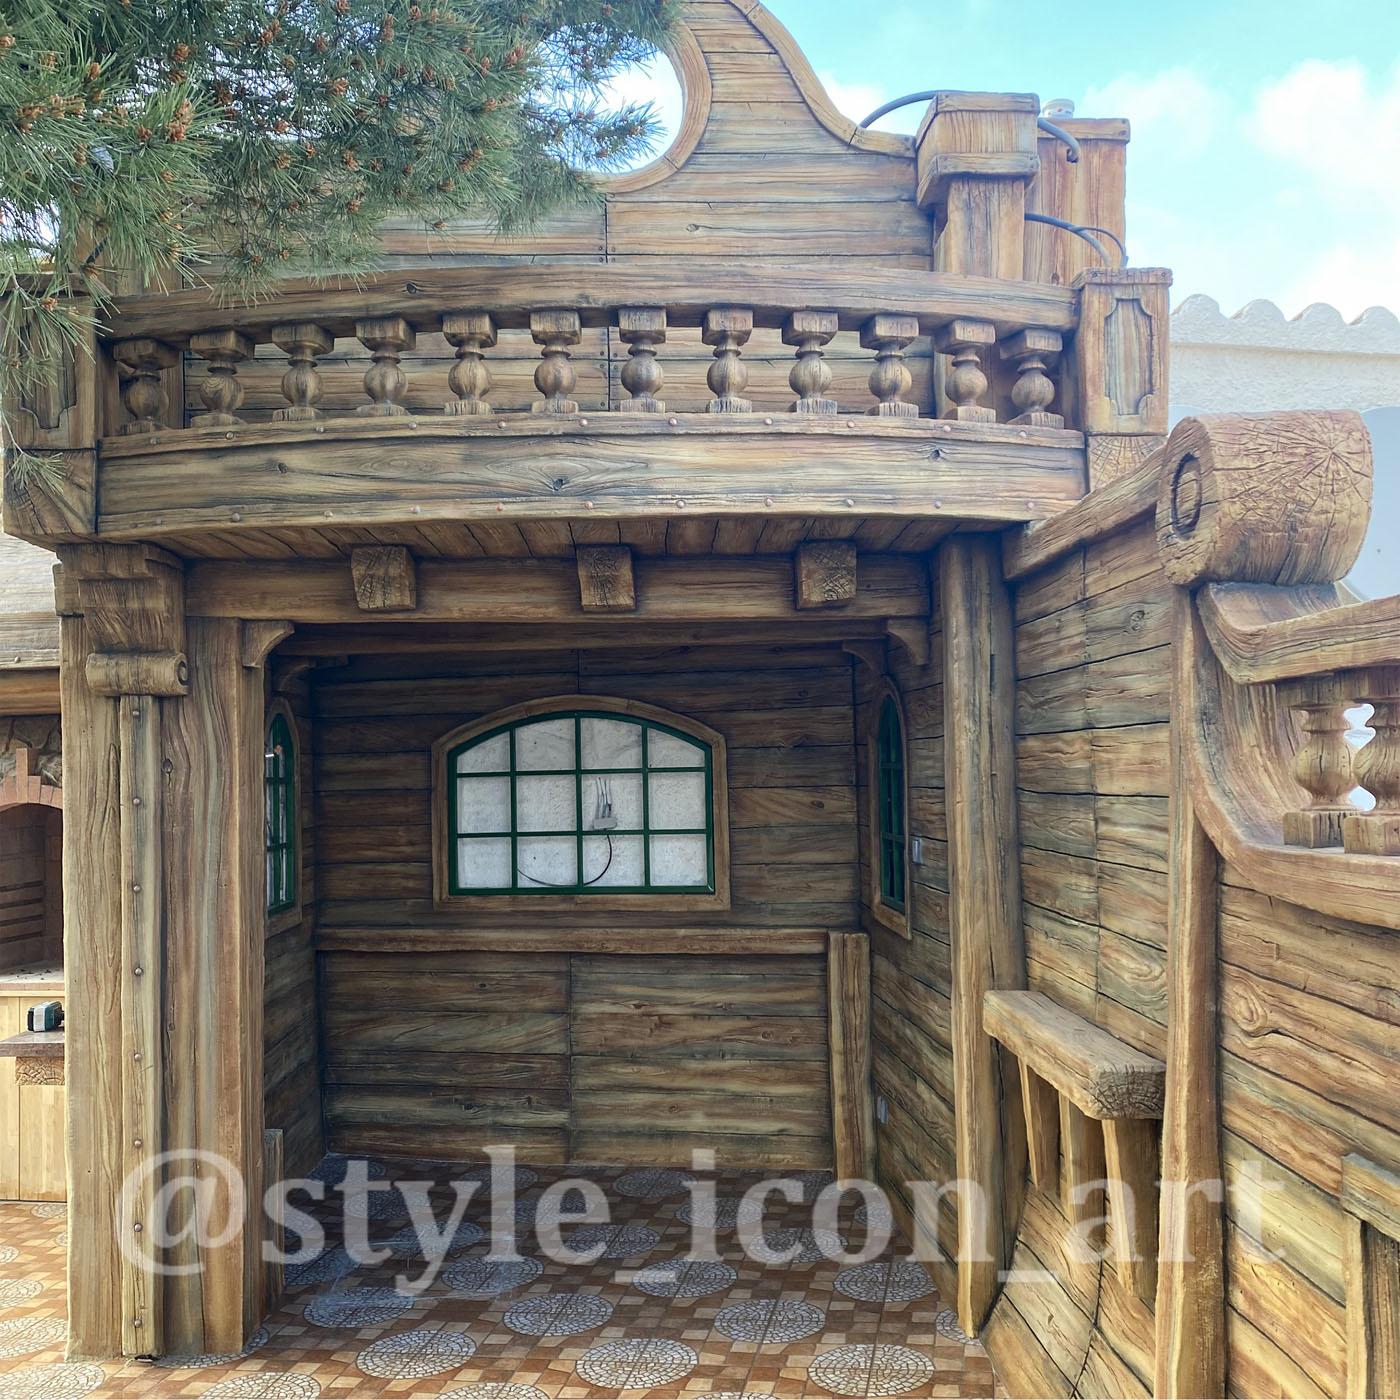 каюта корабля, декоративный балкон из артбетона.